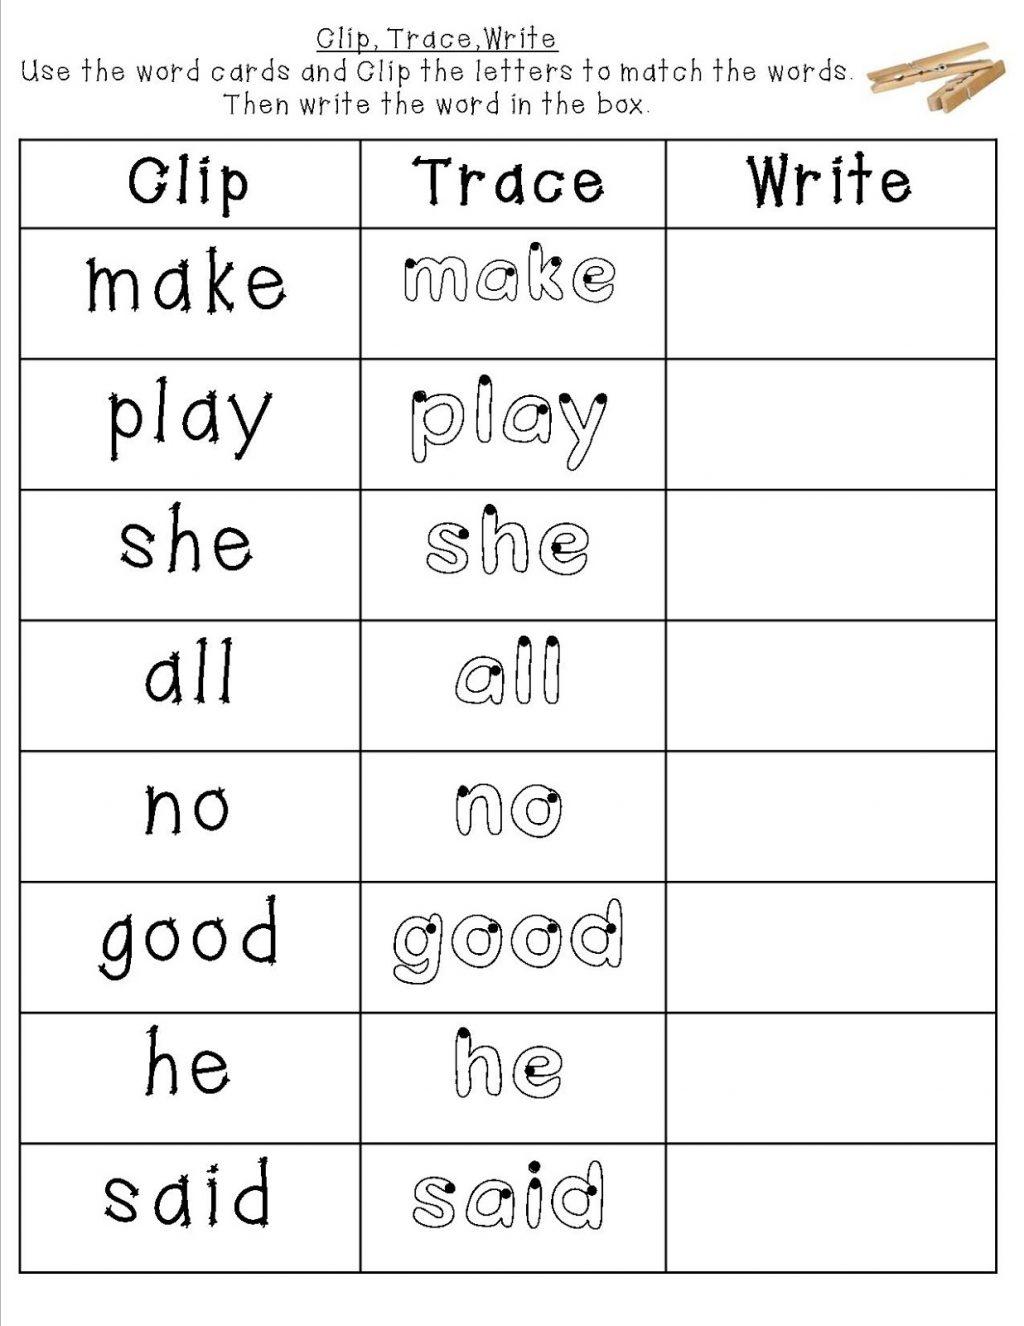 Greatschools Org Nj And Basicndergarten Sight Words Worksheets Fords | Great Schools Printable Worksheets